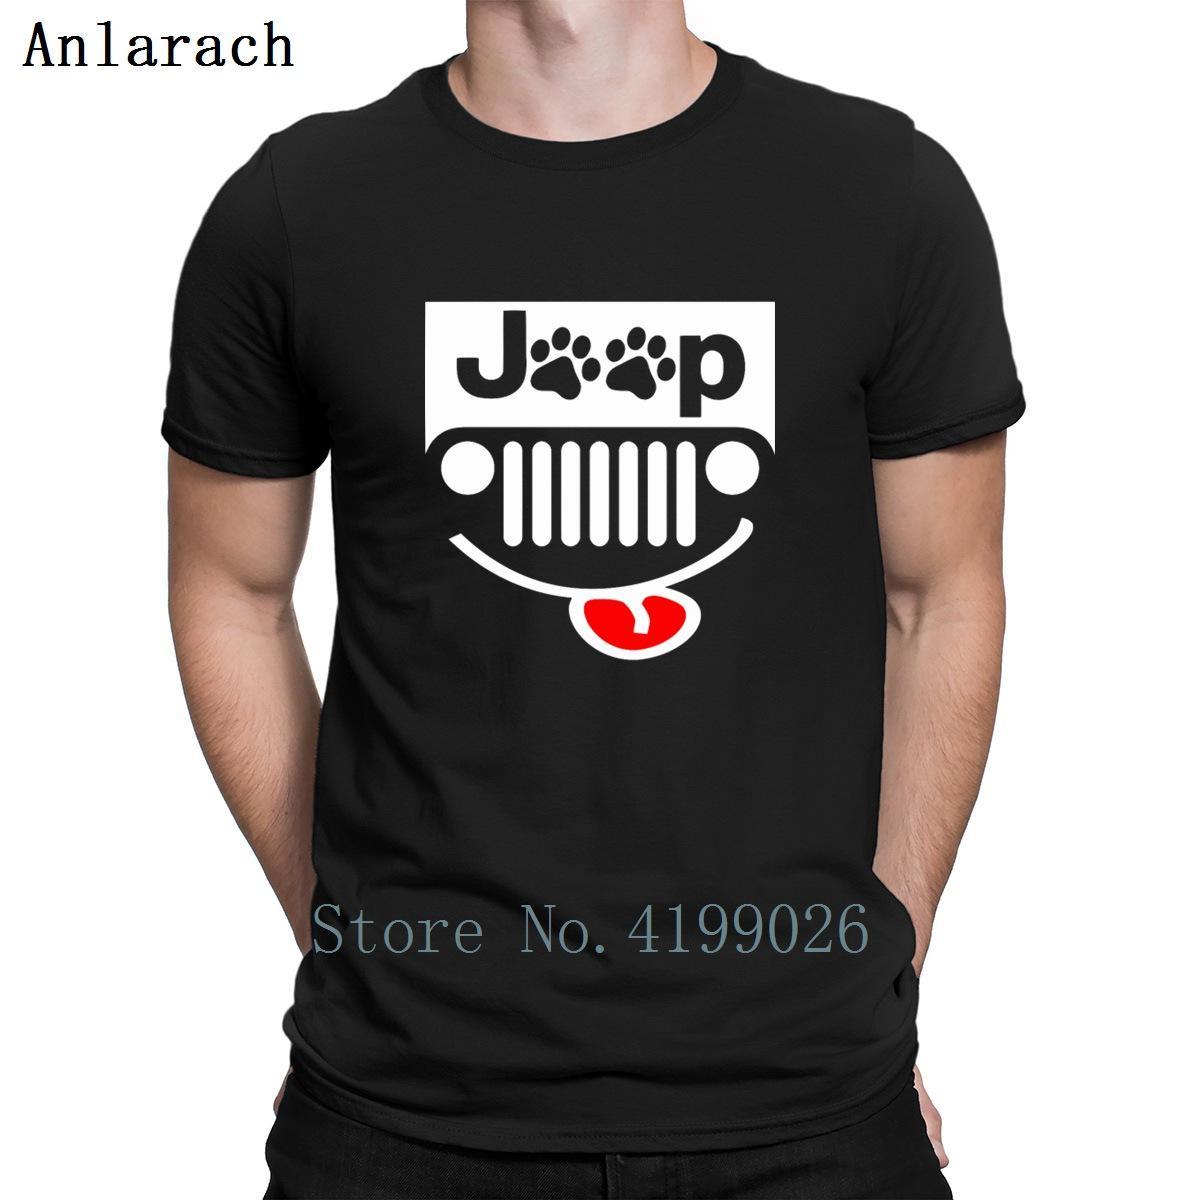 Jipes da pata T-shirt do presente da Primavera Tee Tops Plus Size 3xl camiseta For Men personalizado engraçado Anlarach Gents Vintage